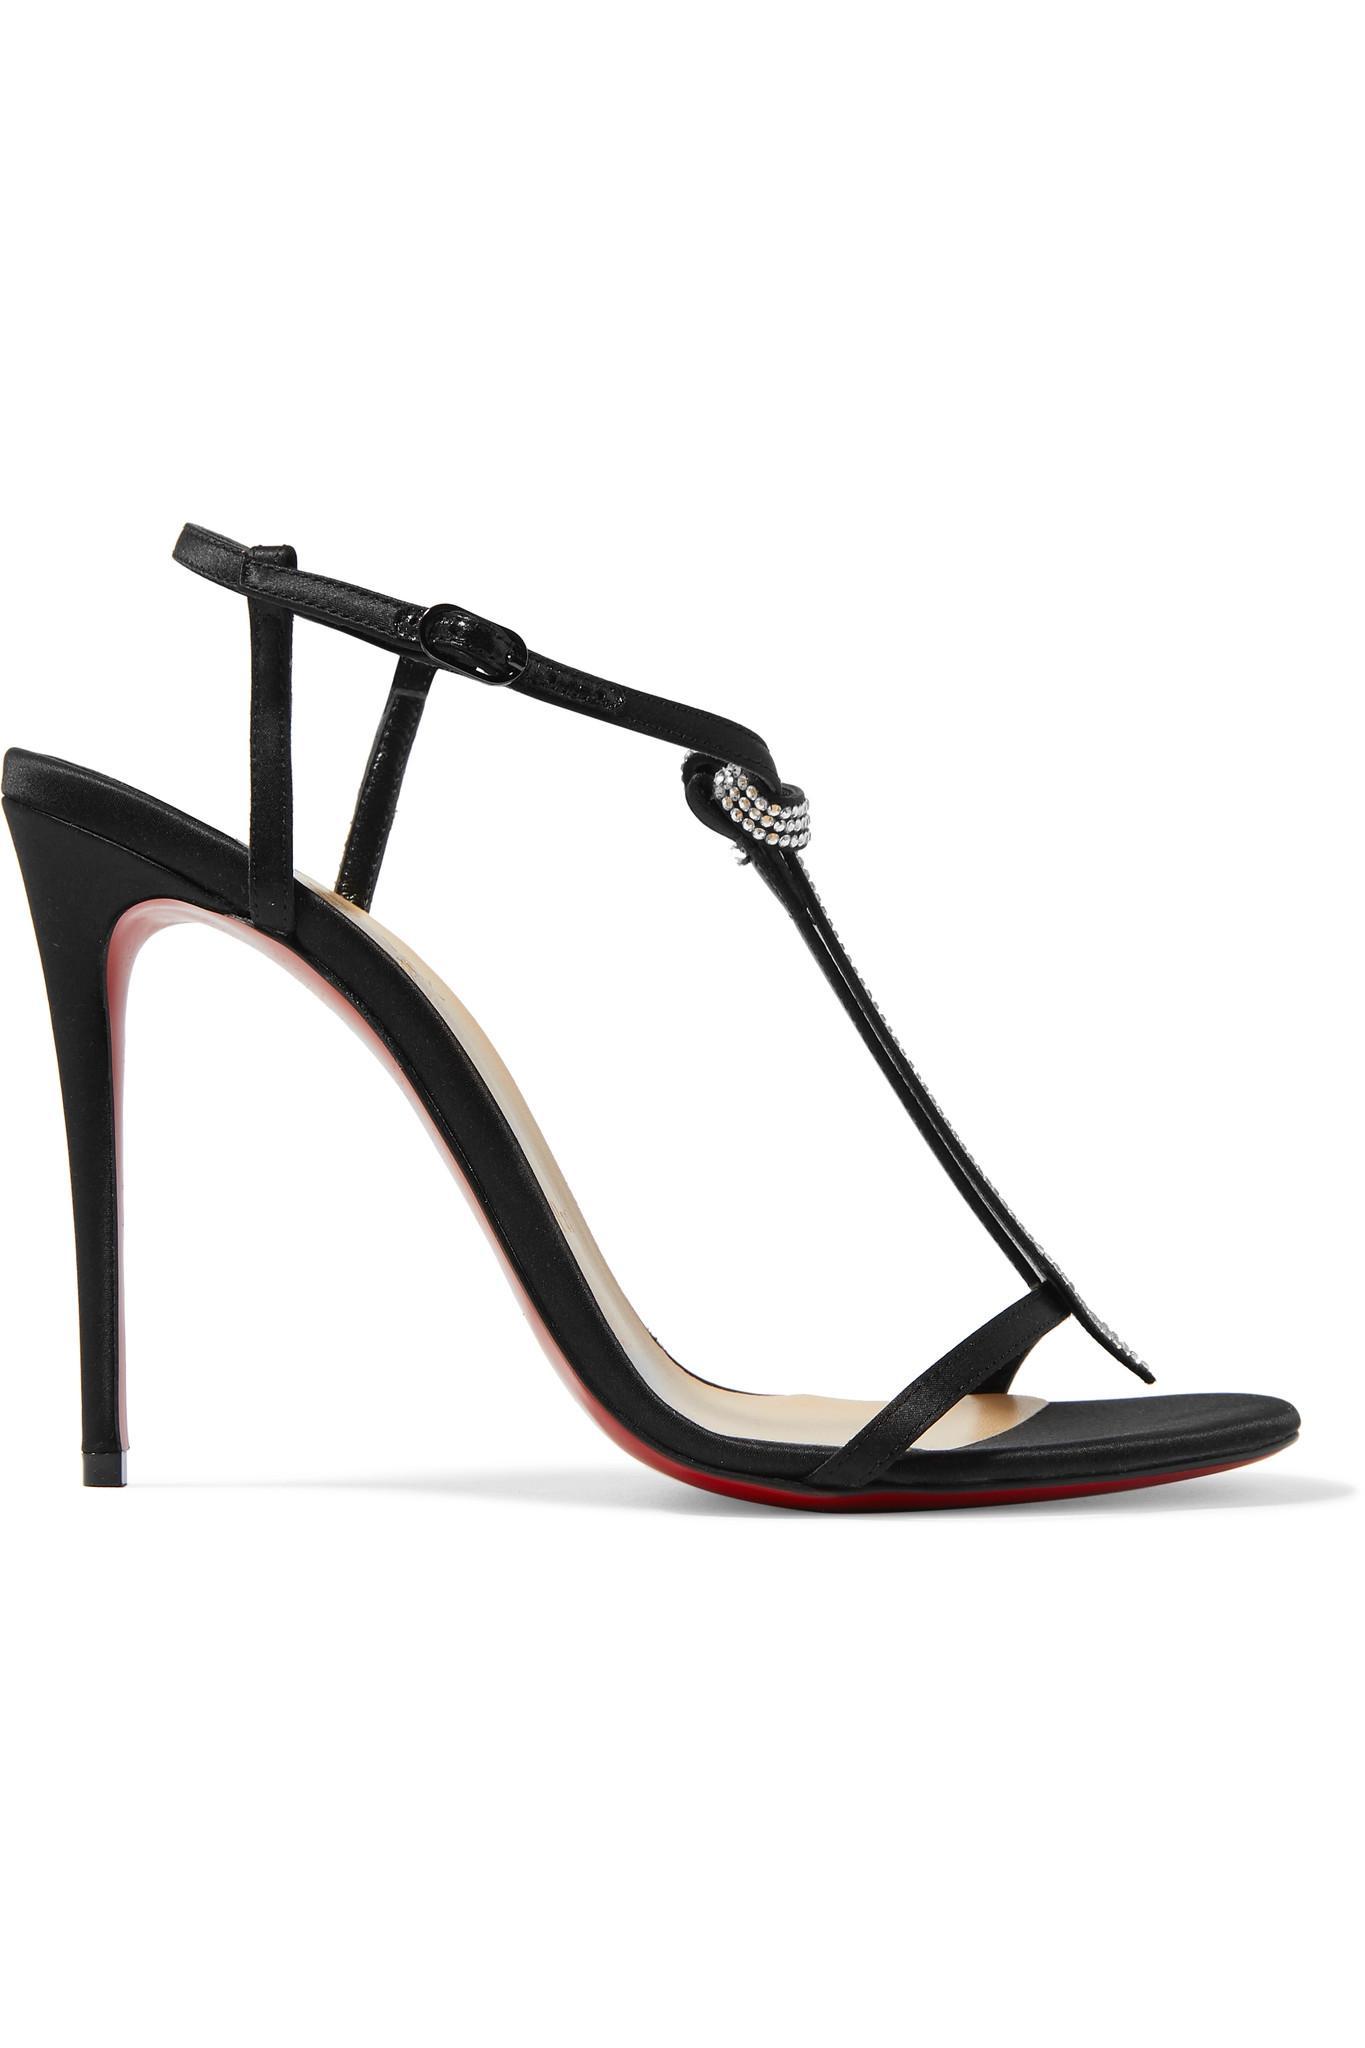 3a04cccf03d Christian Louboutin. Women s Black T Cab 100 Crystal-embellished Satin  Sandals